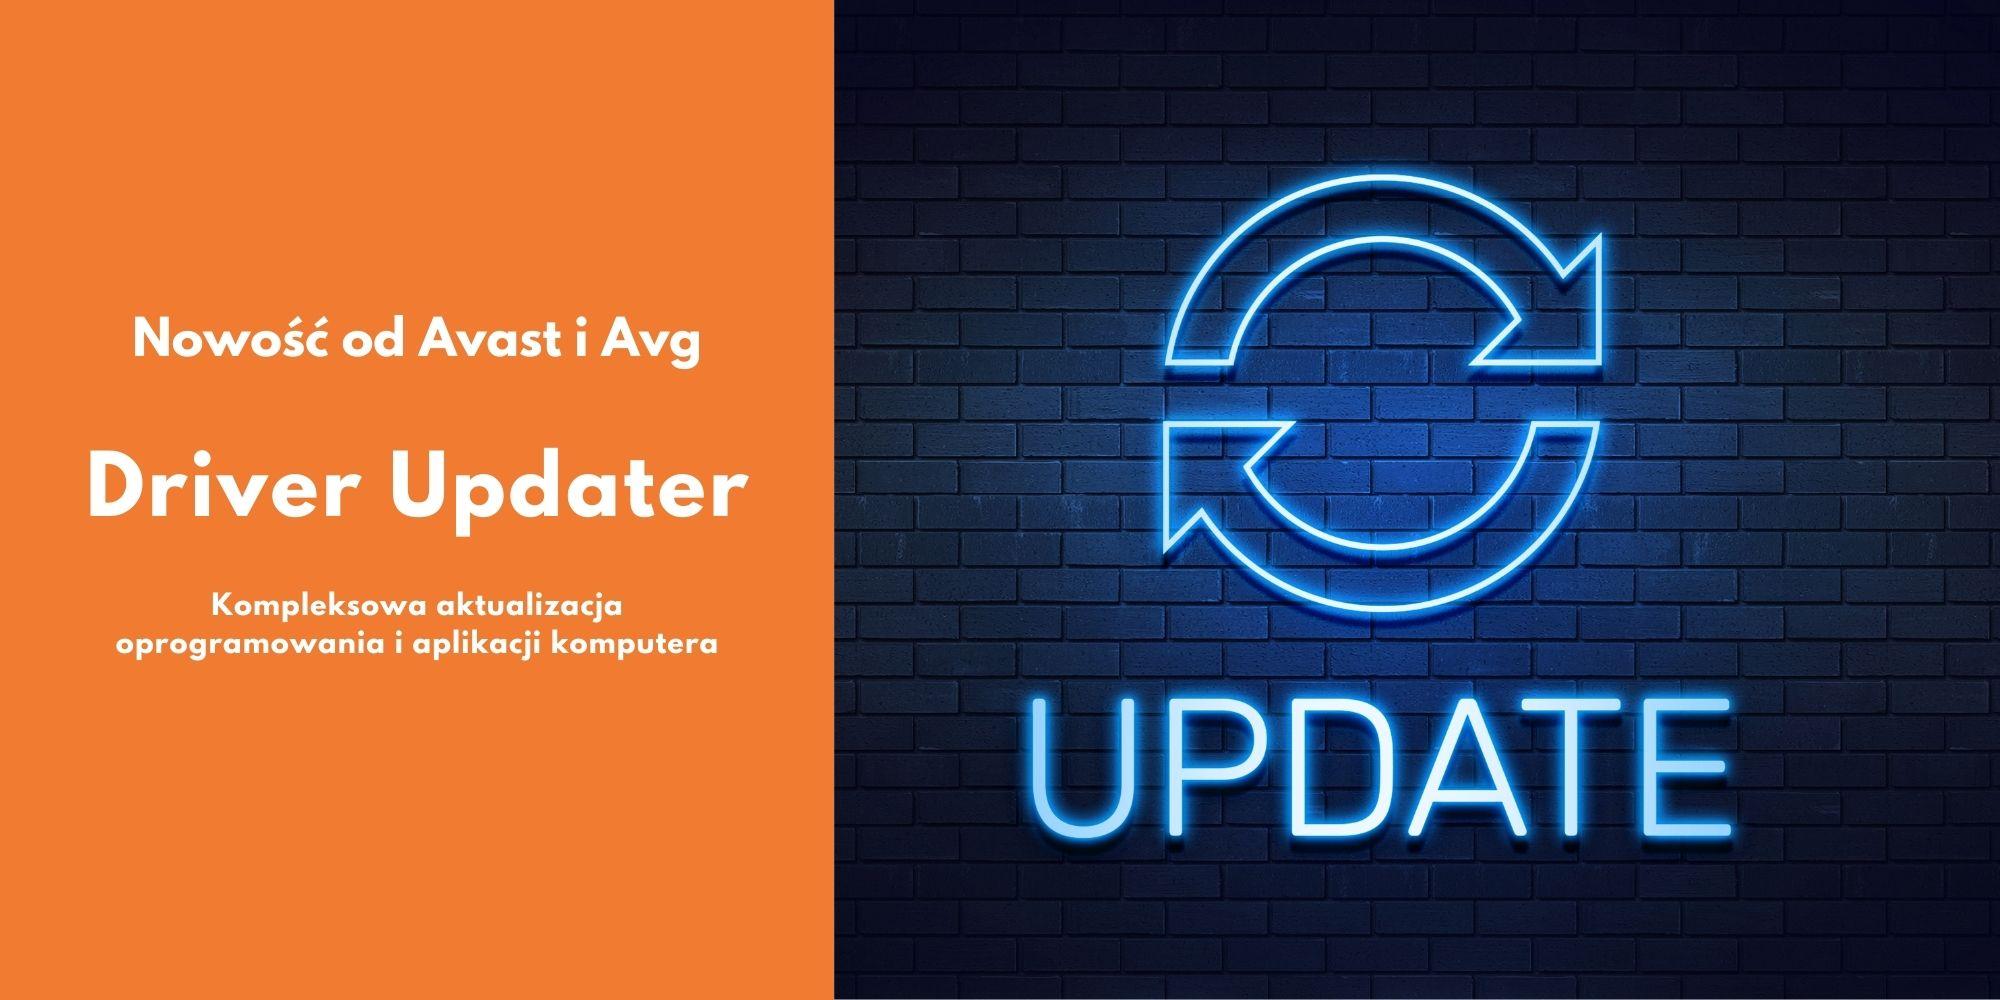 Aktualicacja sterowników dzięki AVG Driver Updater lub Avast Driver Updater.